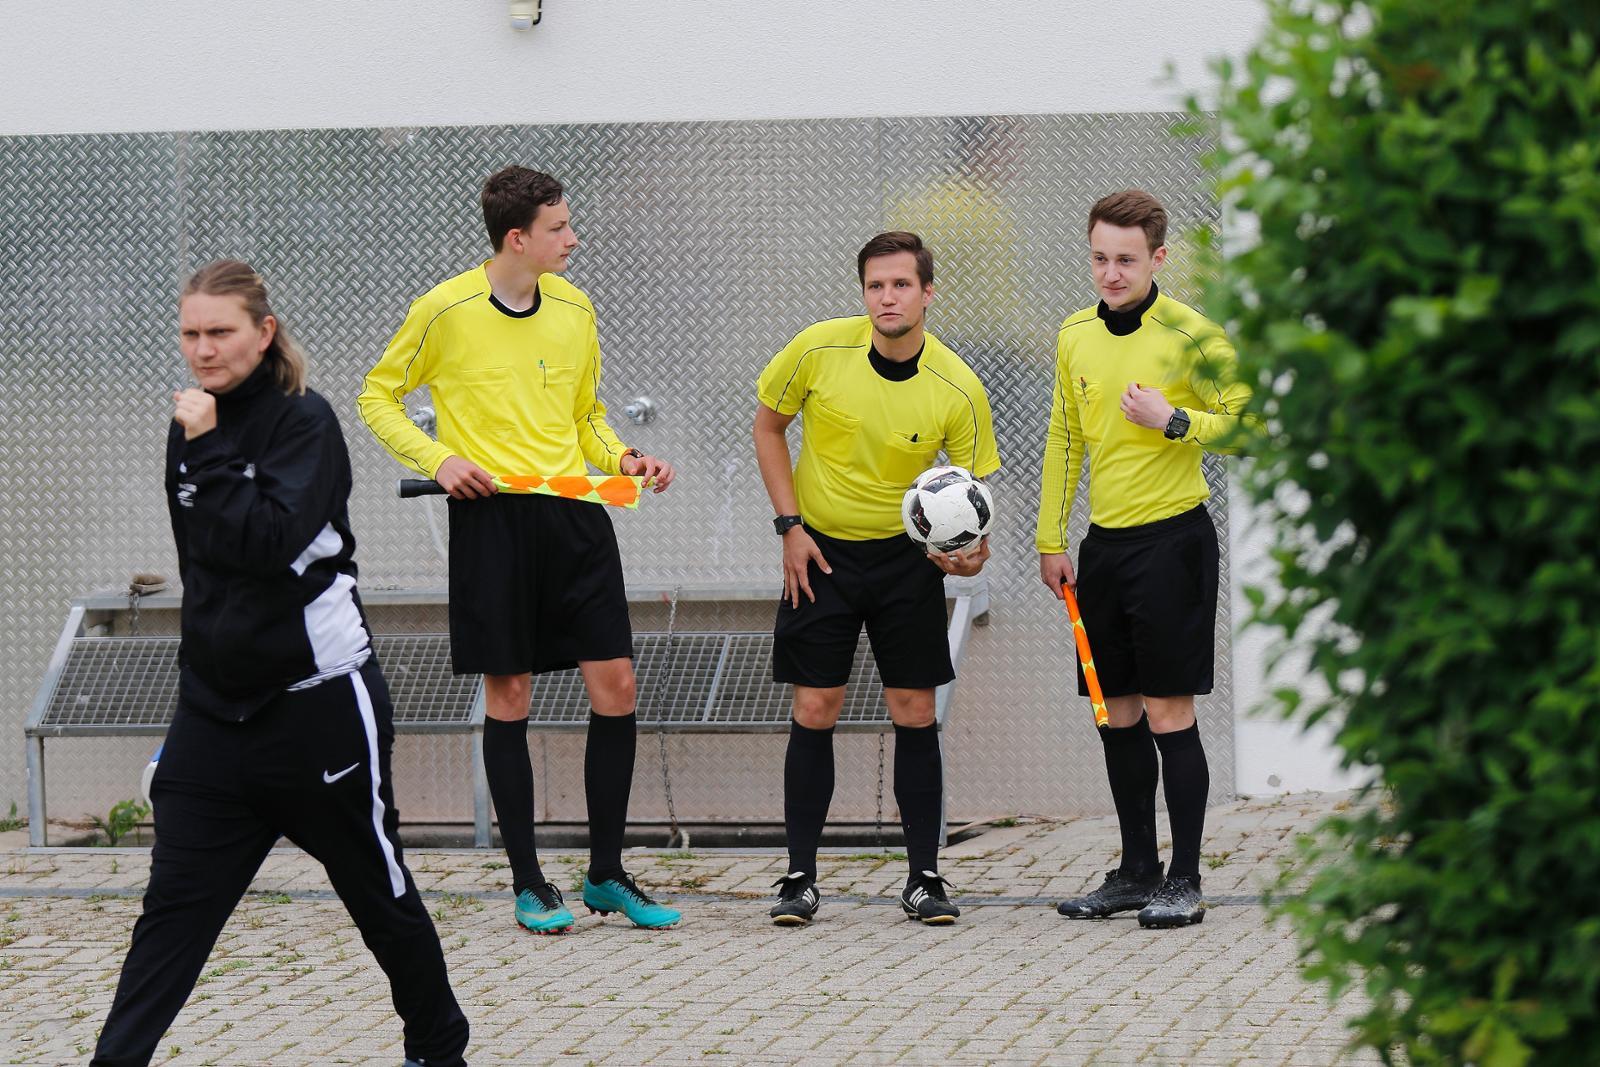 SV Kirchzarten - Herren - Landesliga 2 - Südbadens Doppelpass